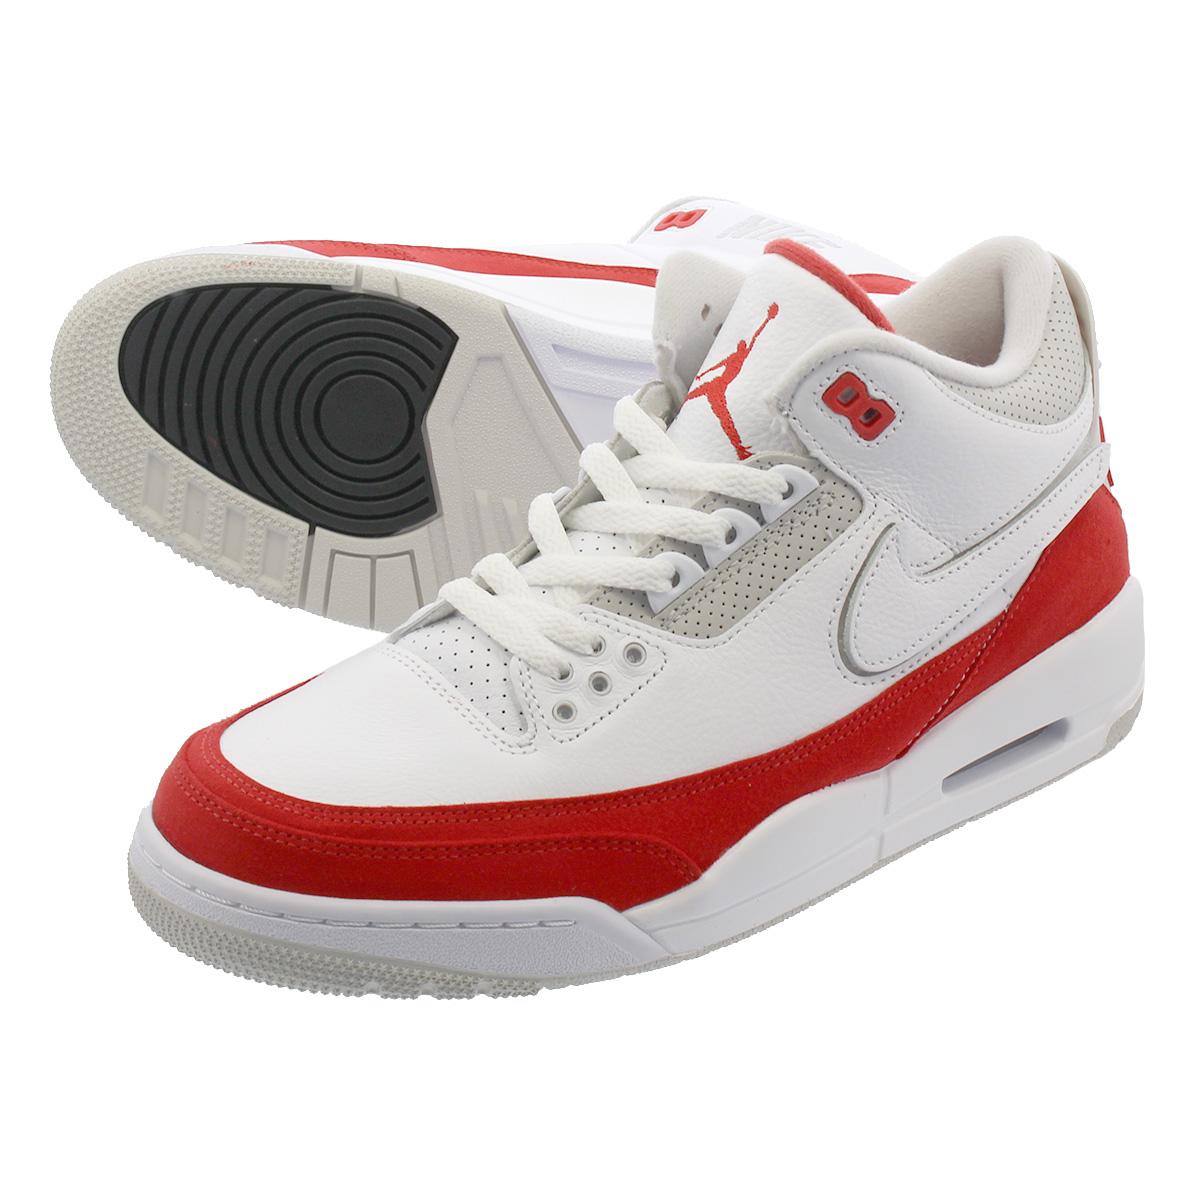 LOWTEX PLUS  NIKE AIR JORDAN 3 TINKER Nike Air Jordan 3 ティンカー WHITE UNIVERSITY  RED NEUTRAL GREY cj0939-100  99dbd31e6